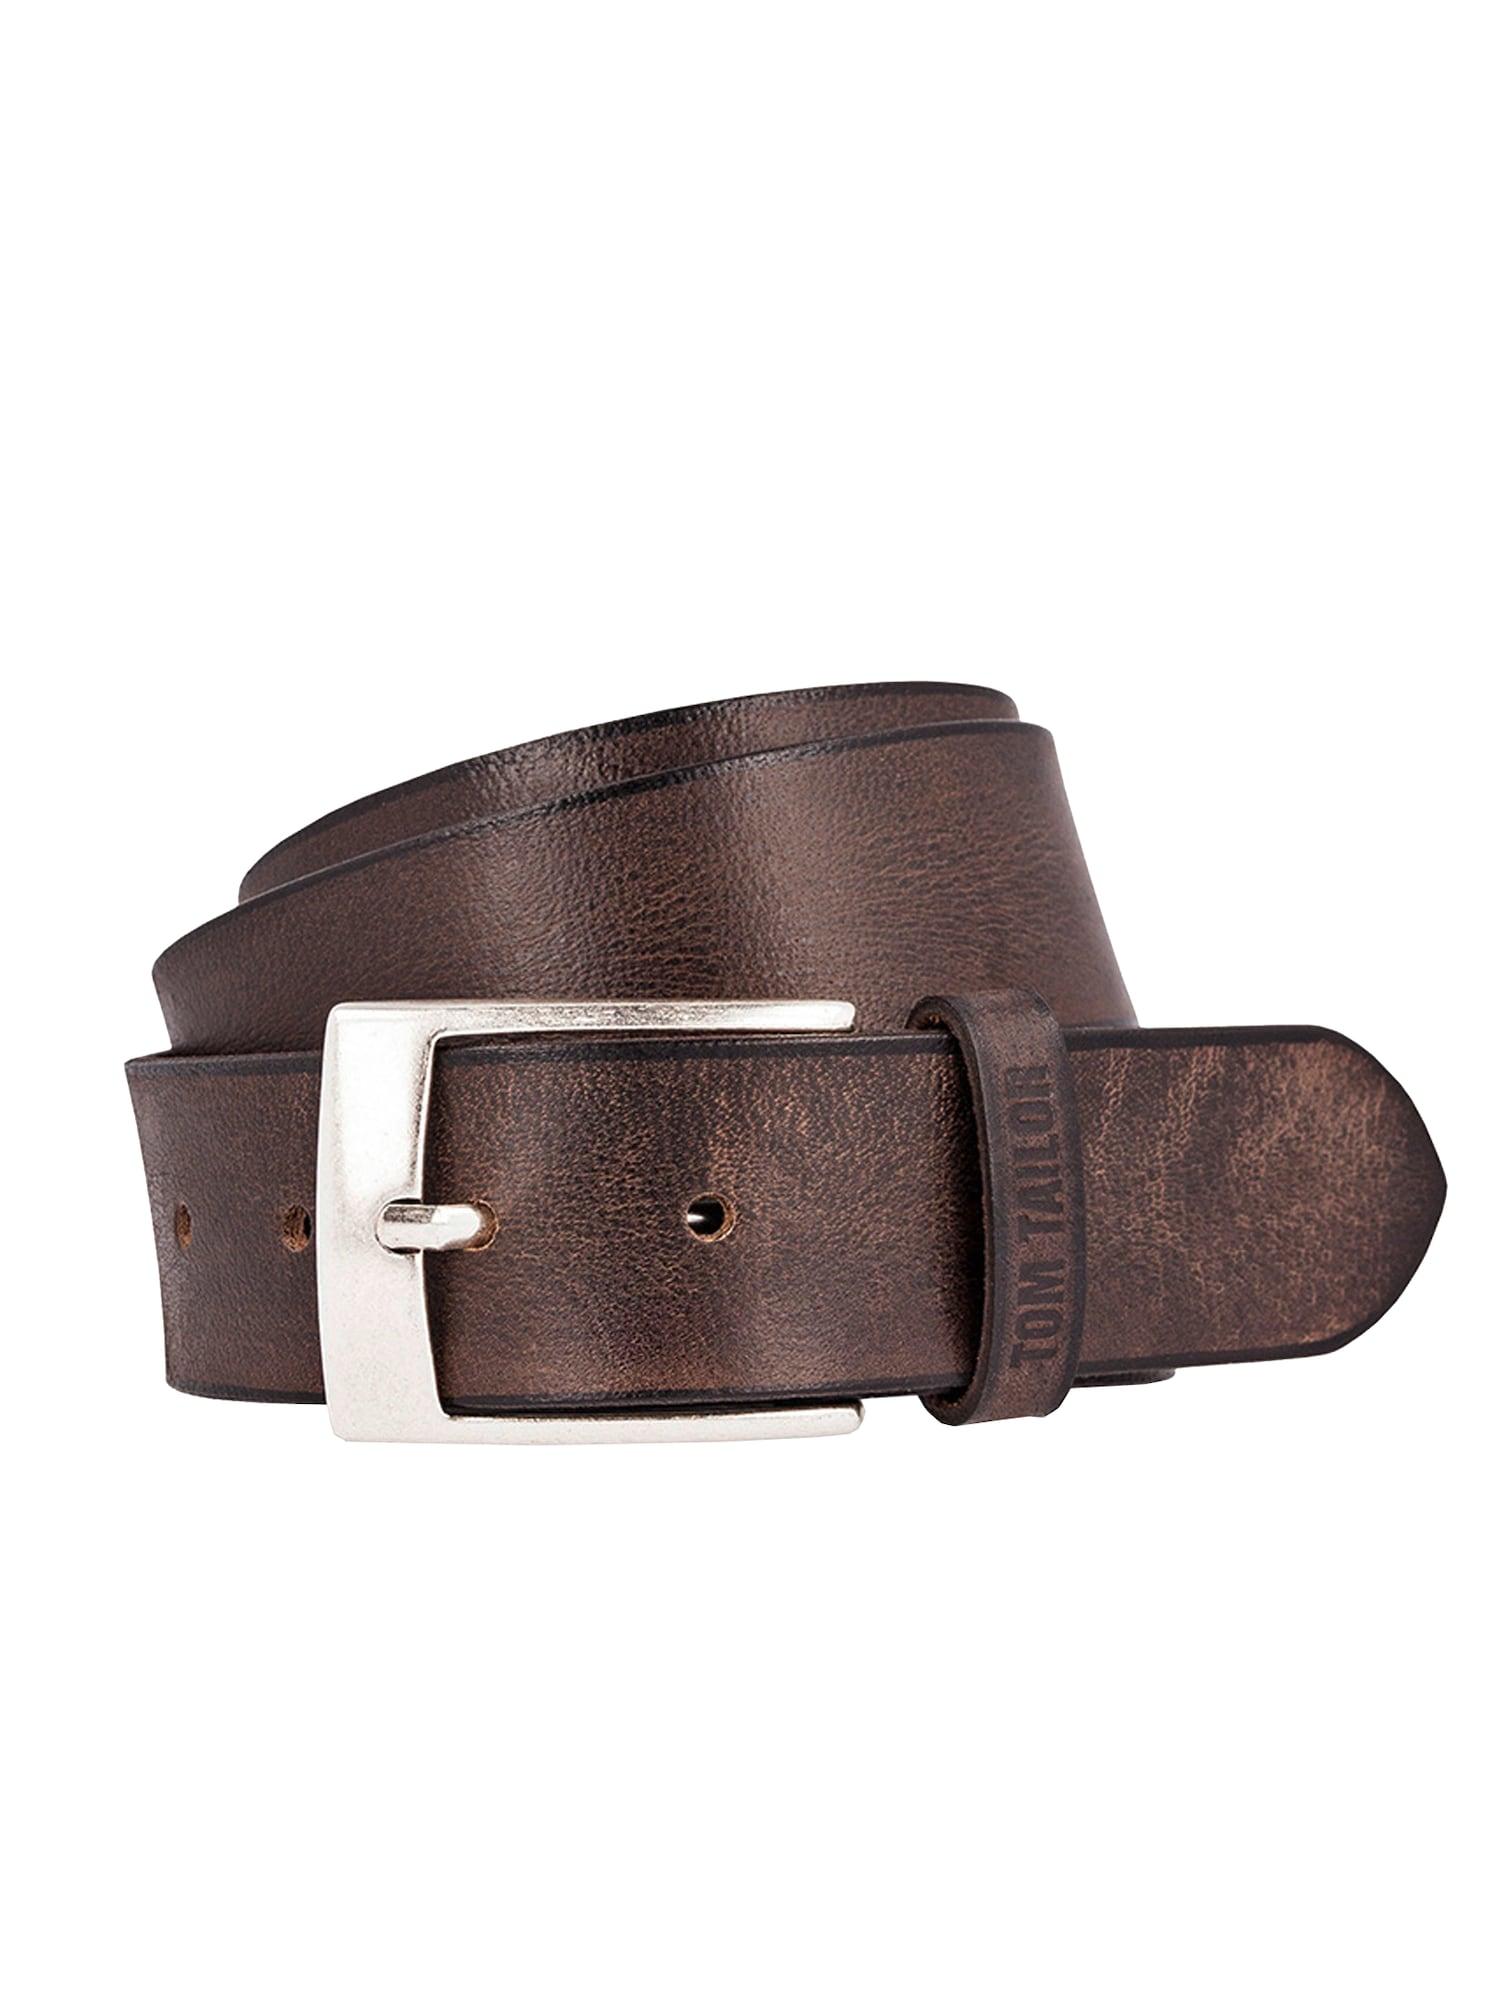 TOM TAILOR Opasky 'Used fullgrain leather belt'  tmavohnedá